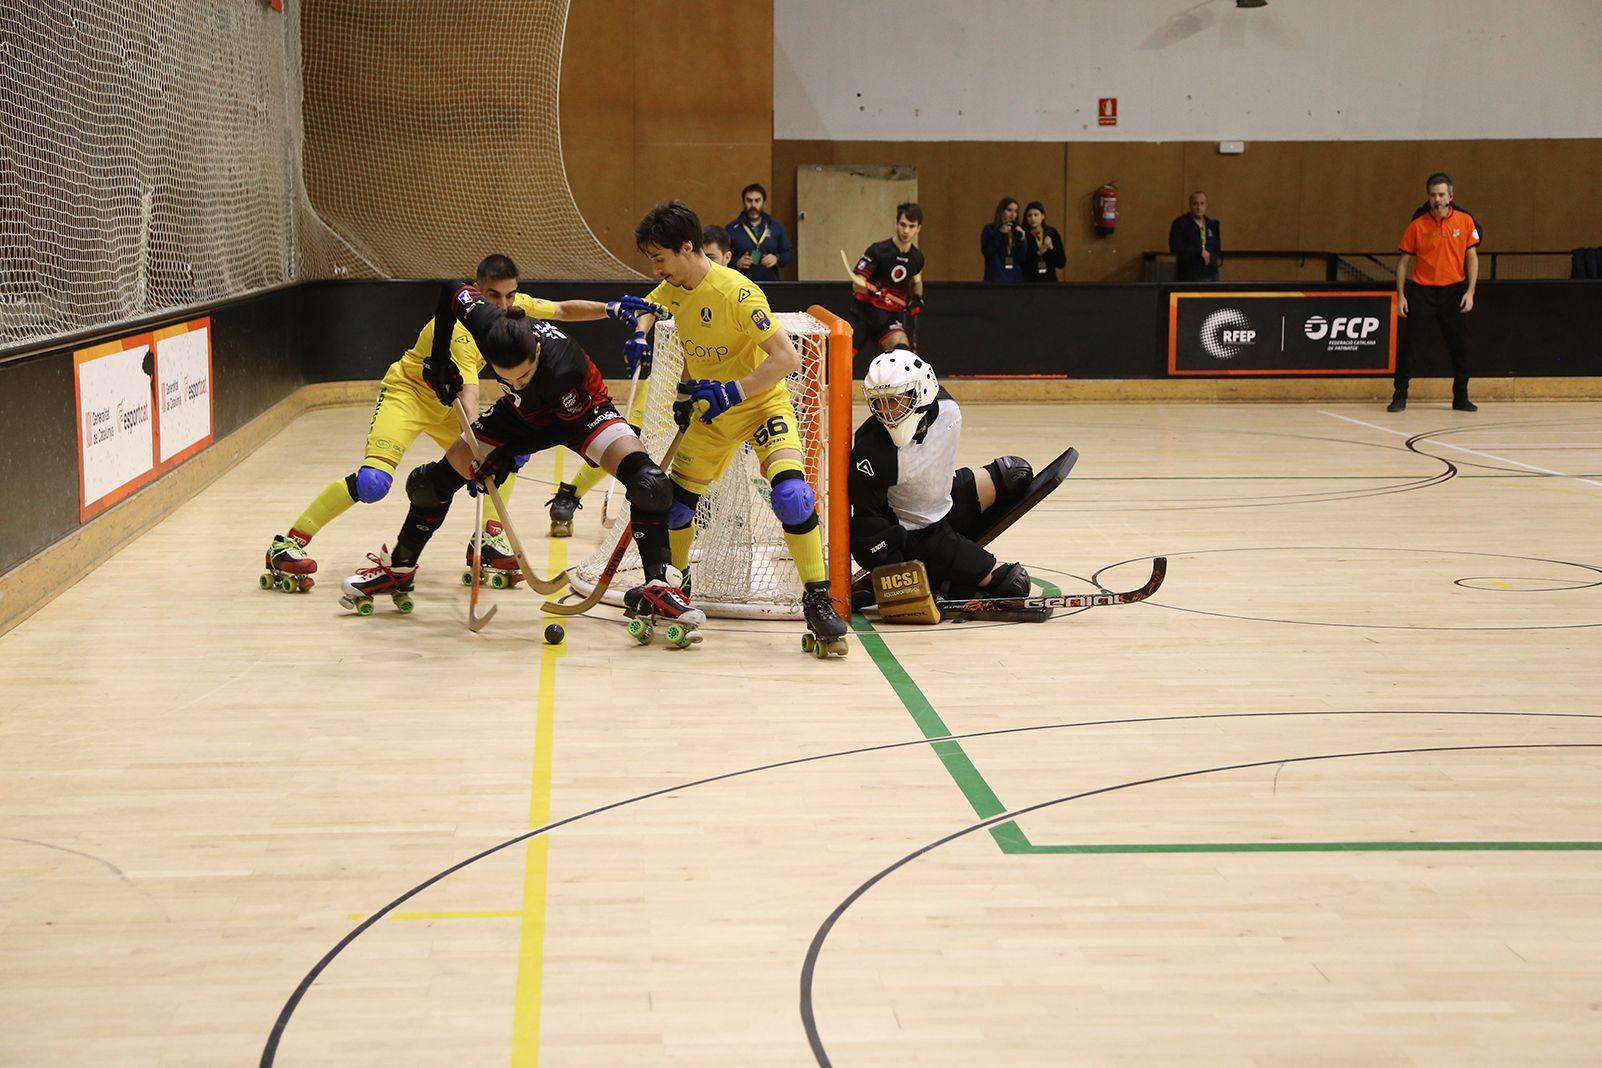 Partit de lliga hoquei  sobre patins masculí PHC Sant Cugat- HC Sannt Just. FOTO: Anna Bassa